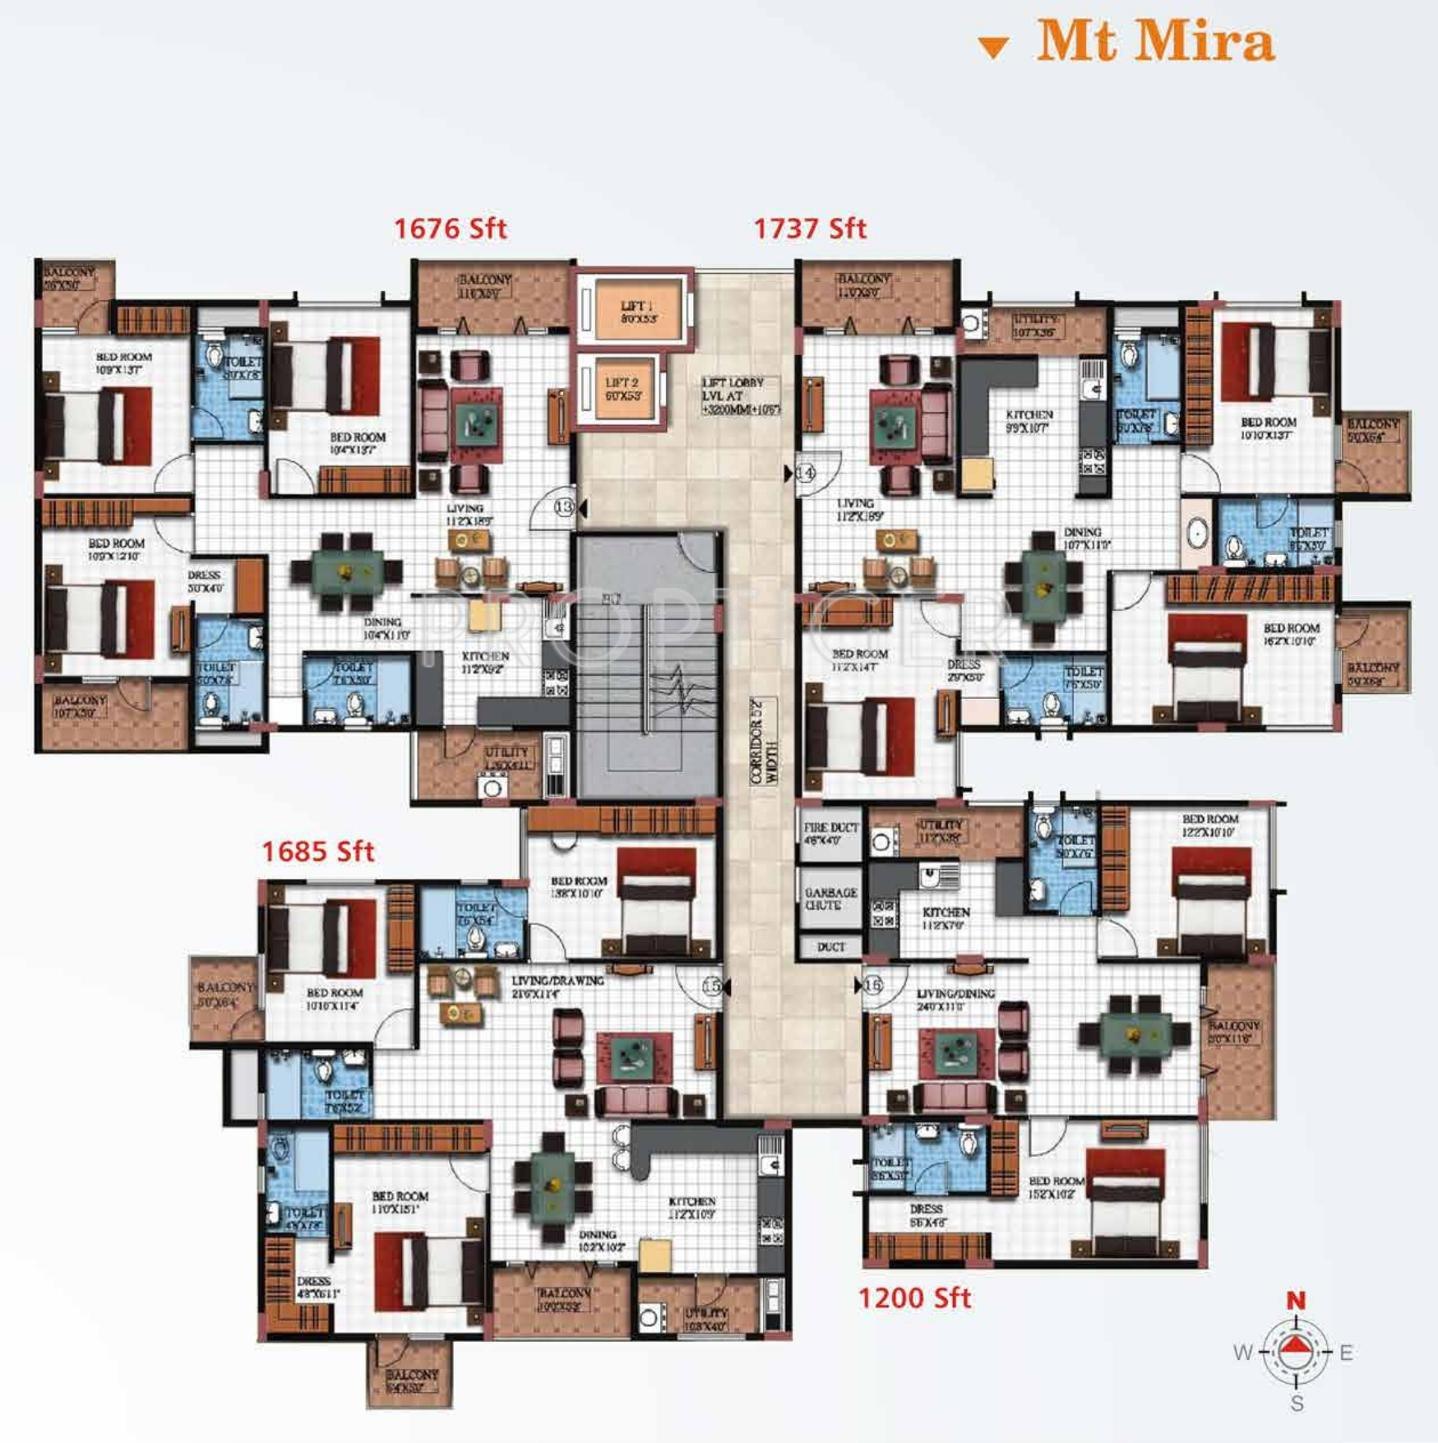 Sun Ridge Apartments: 1200 Sq Ft 2 BHK 2T Apartment For Sale In Vishnu Priya